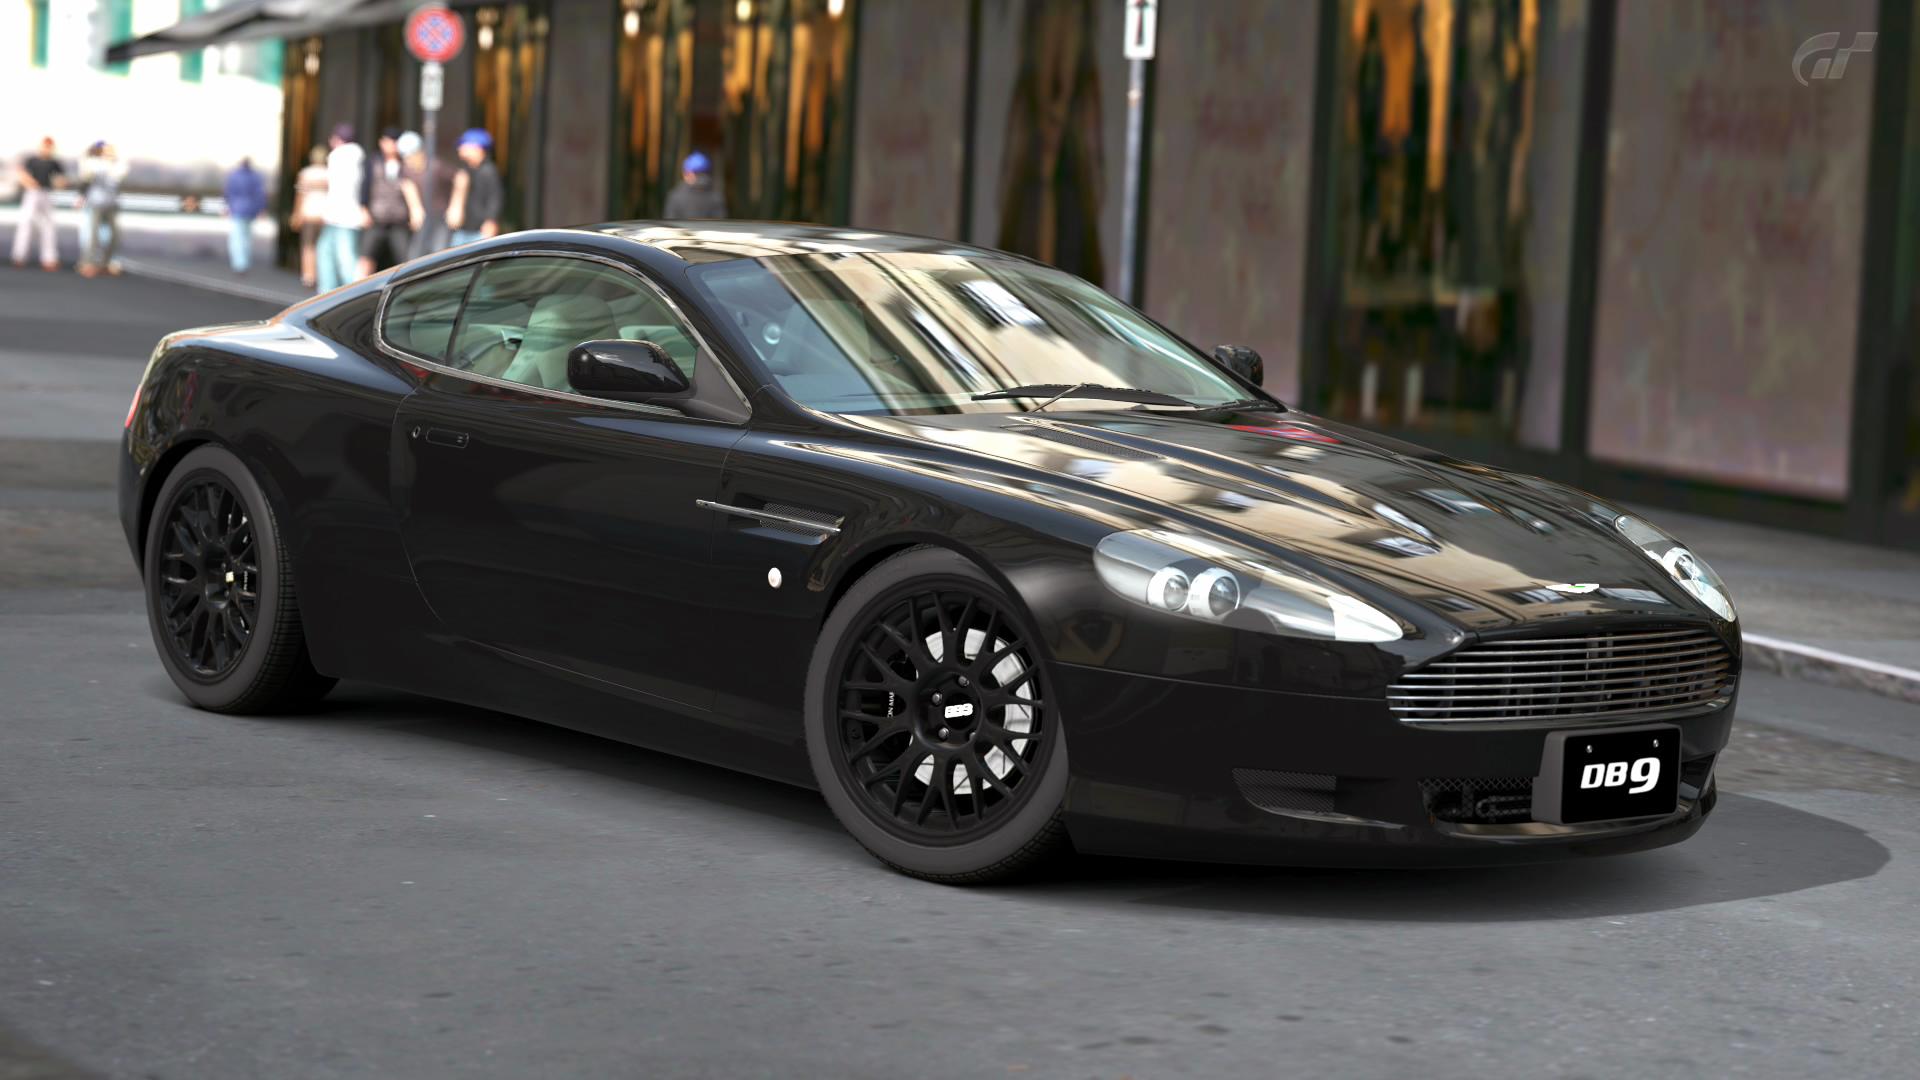 Aston Martin DB Gran Turismo By Vertualissimo On DeviantArt - 2006 aston martin db9